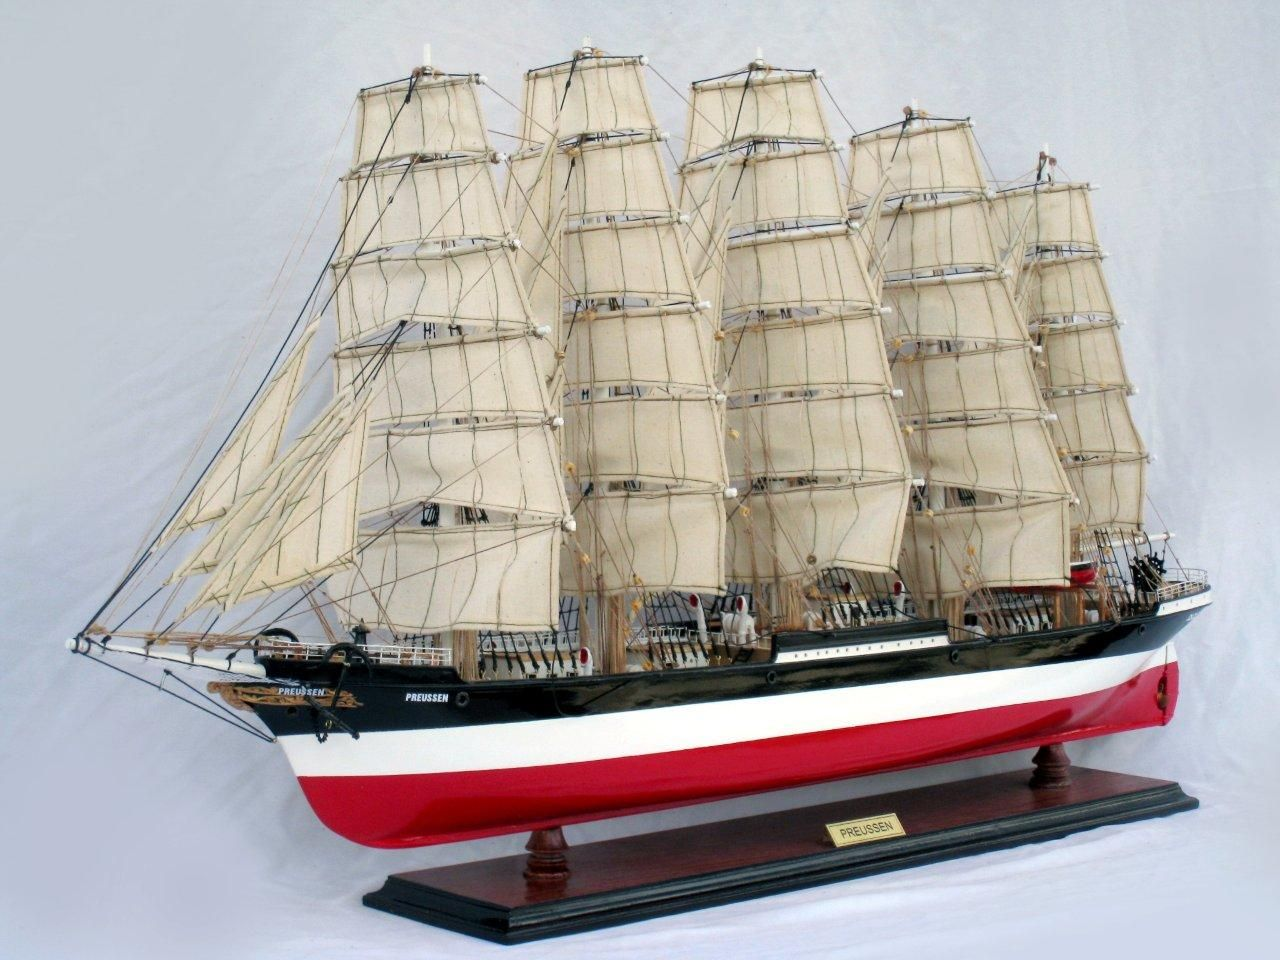 2086-12585-Preussen-Model-Boat